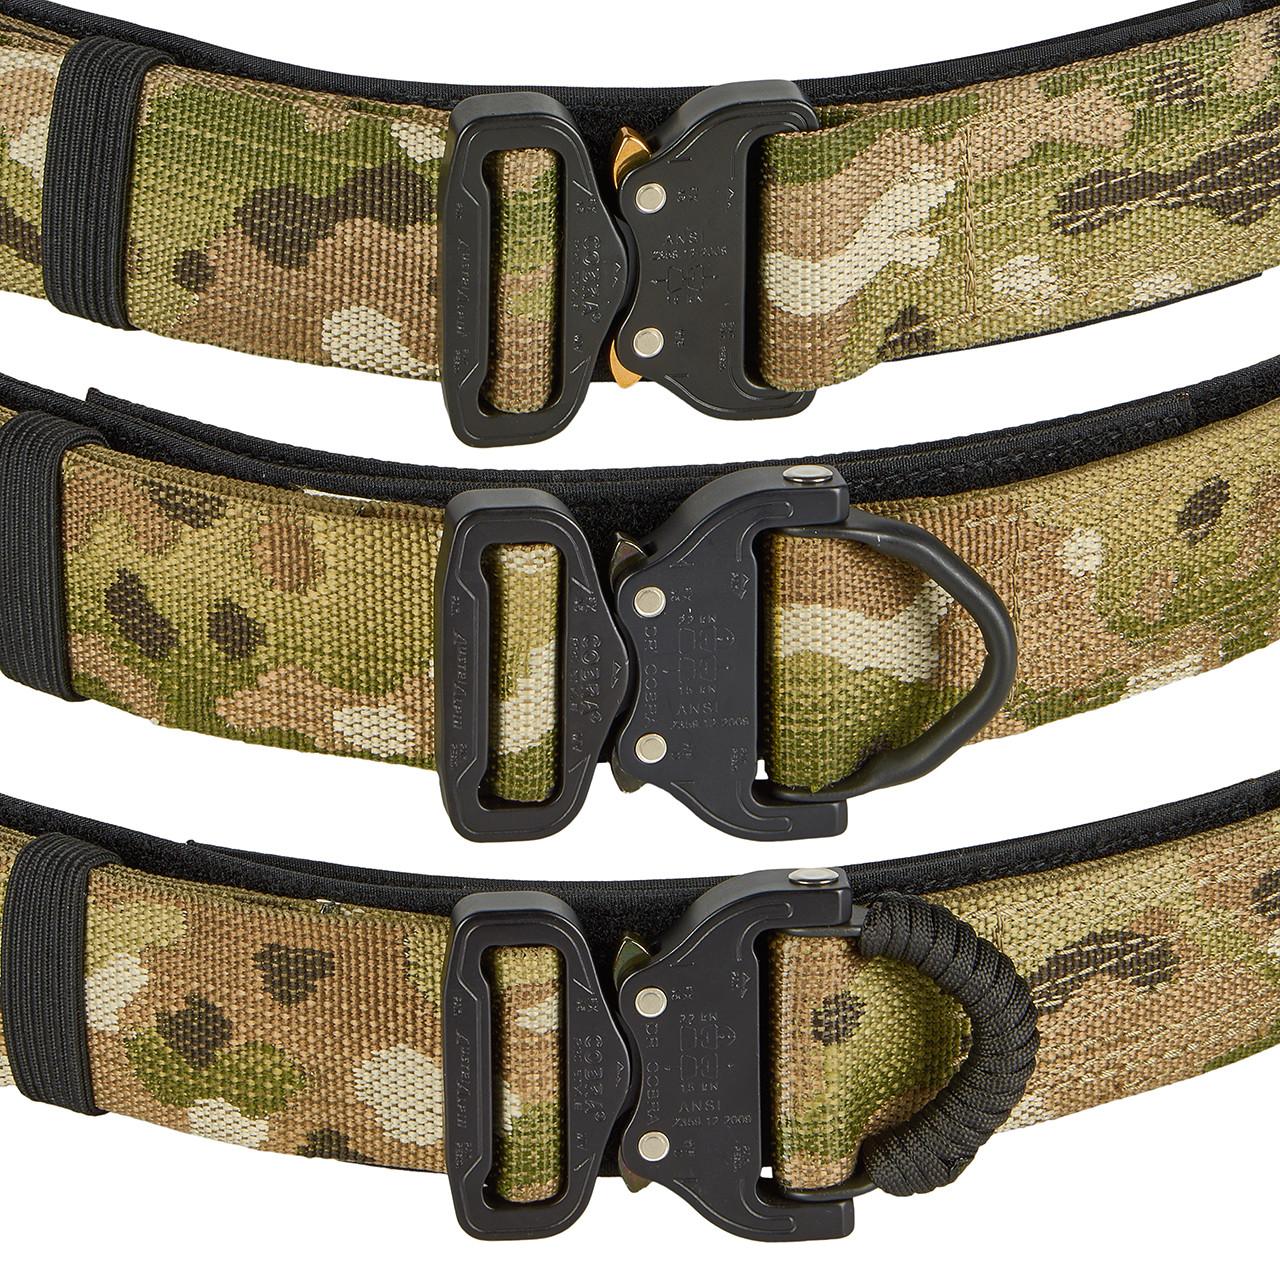 AustriAlpin Cobra buckle. Tactical belt